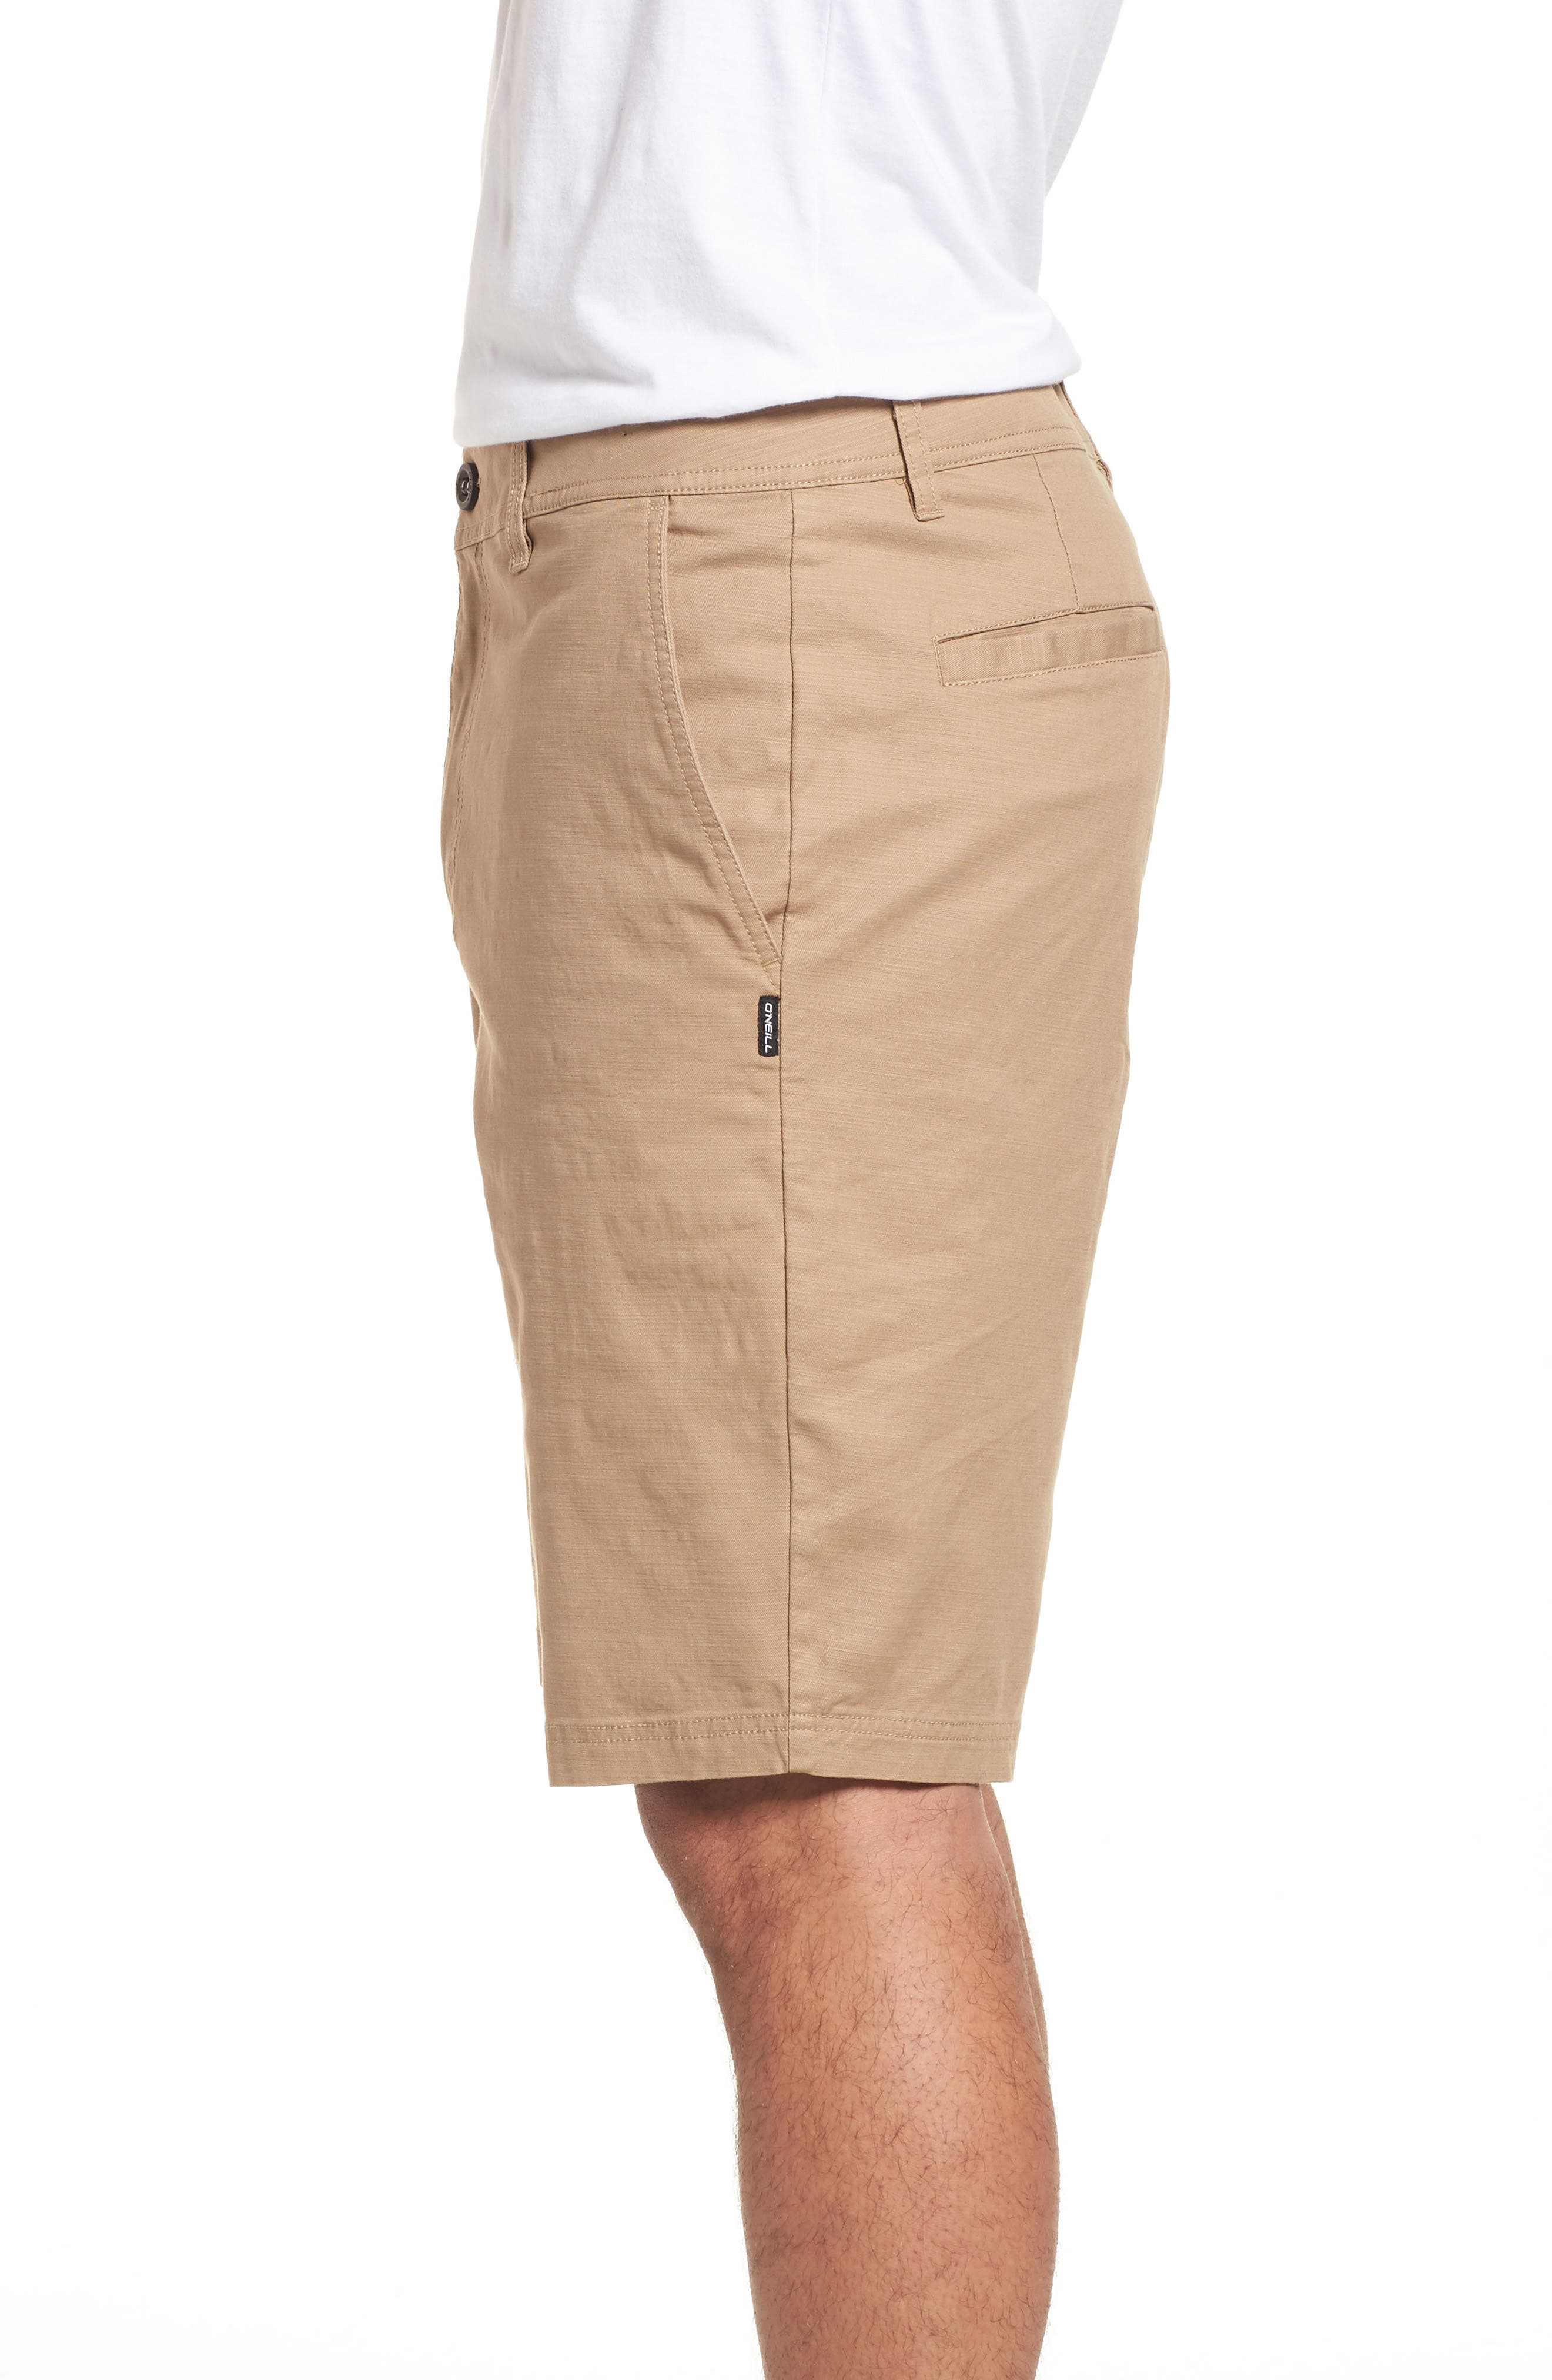 Jay Stretch Chino Shorts,                             Alternate thumbnail 12, color,